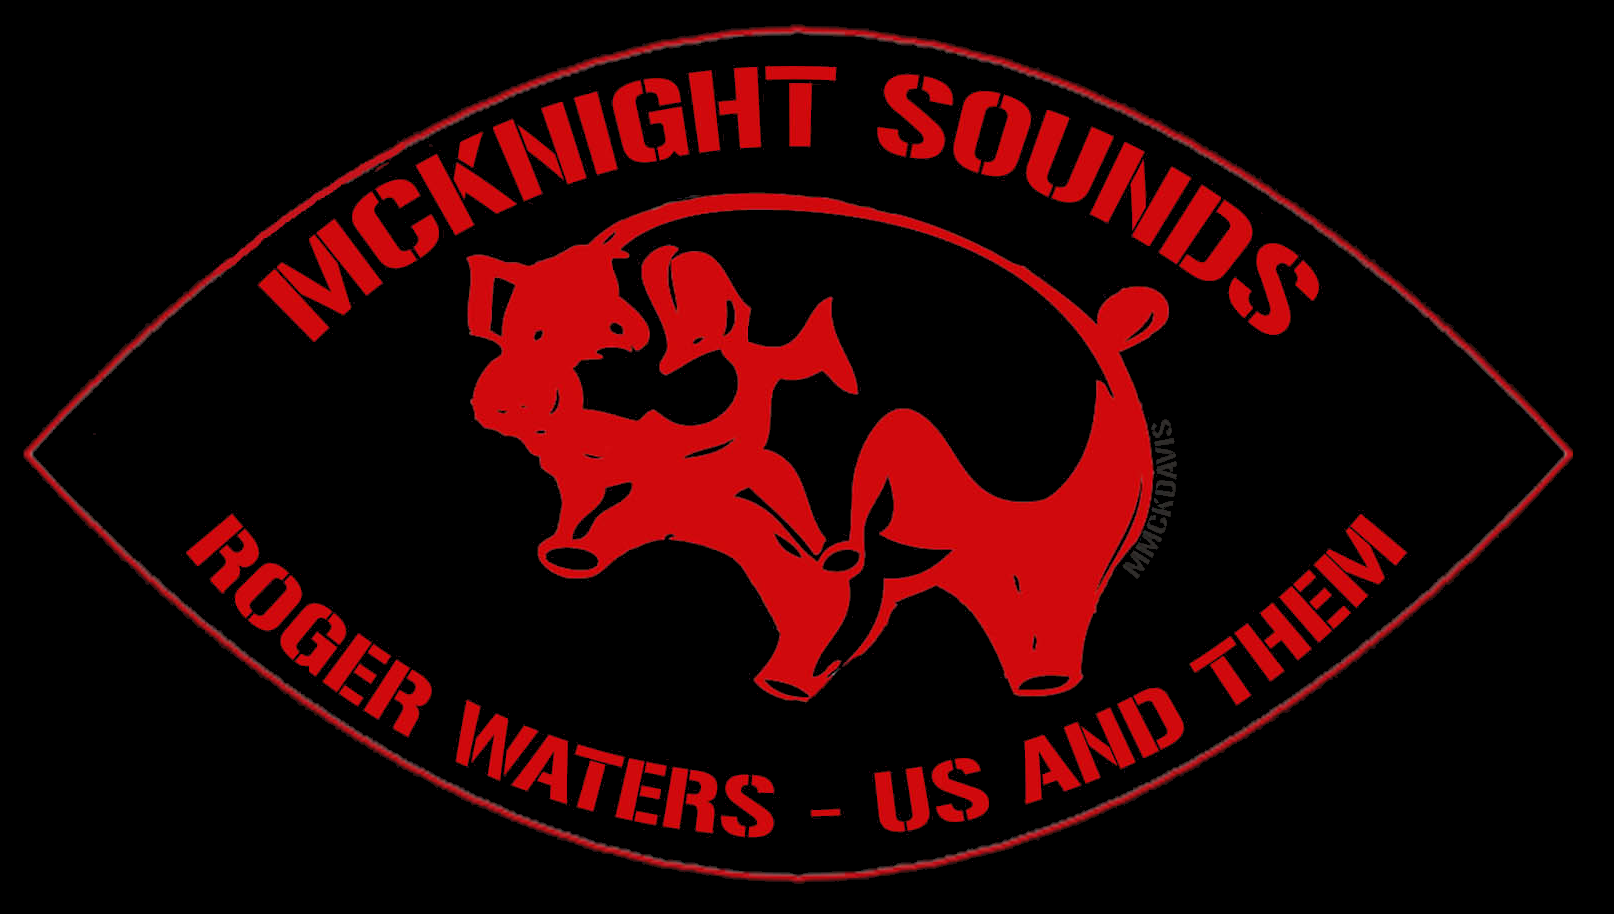 Mike McKnight - Sounds Inc.